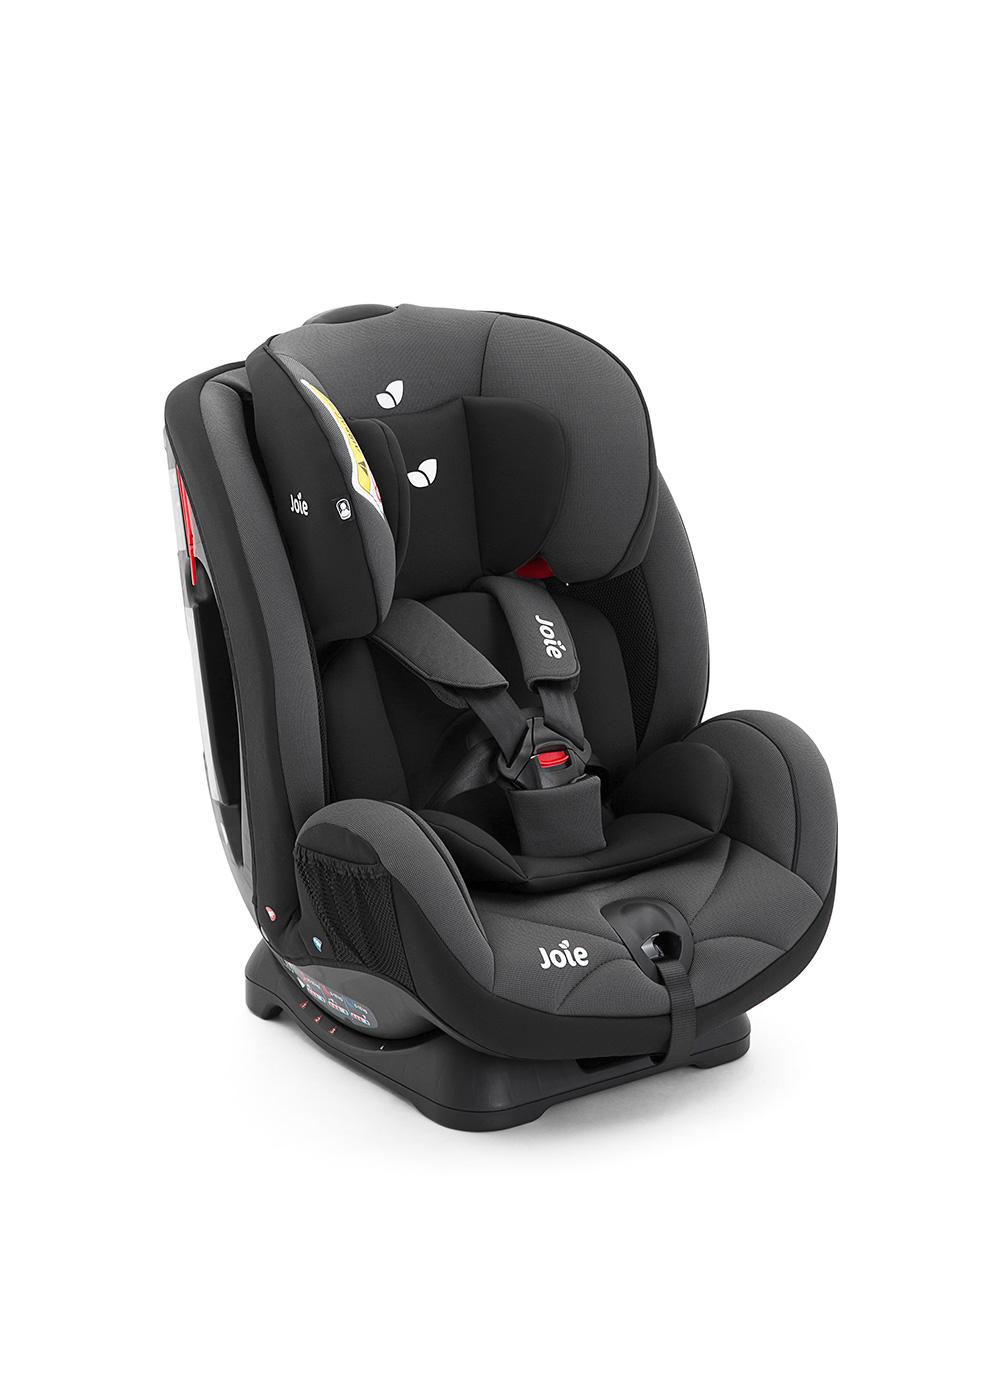 Rent a child seat